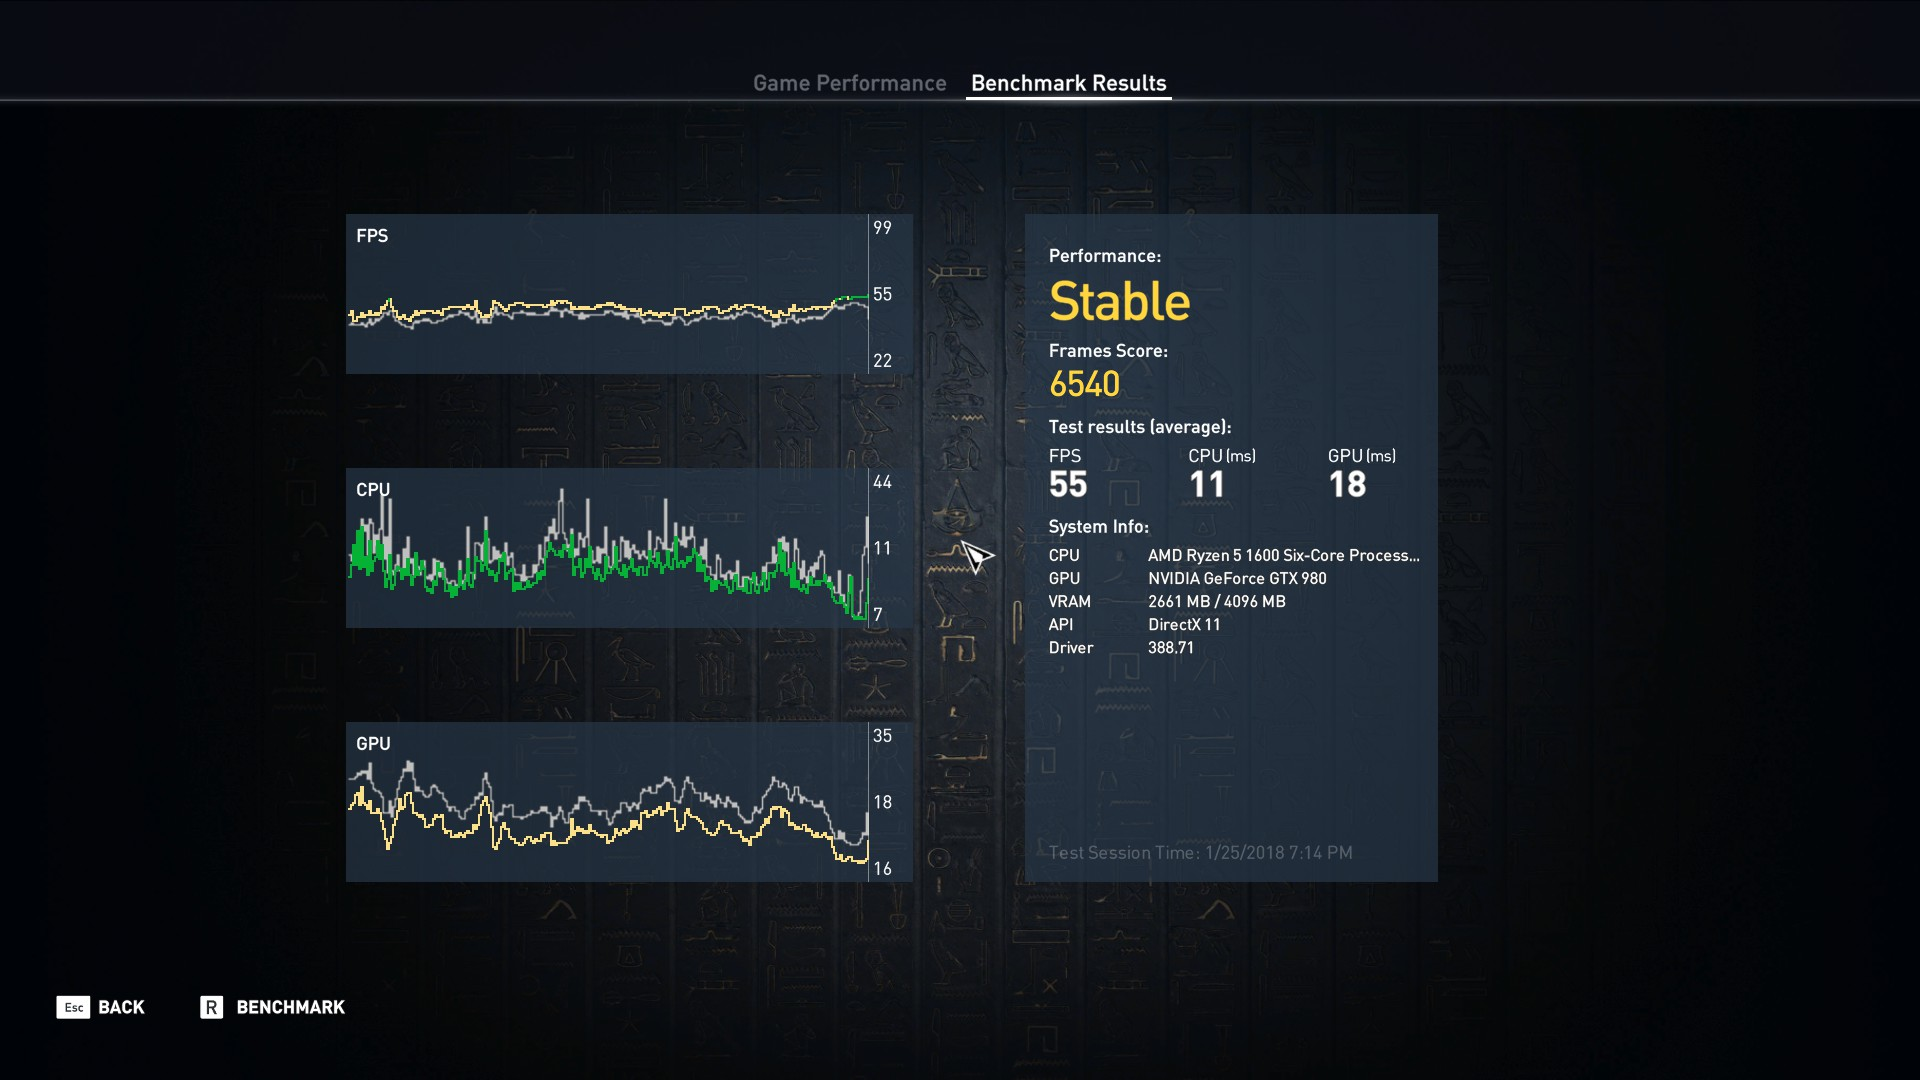 ACOrigins - 980 - Very High - 1080p - results